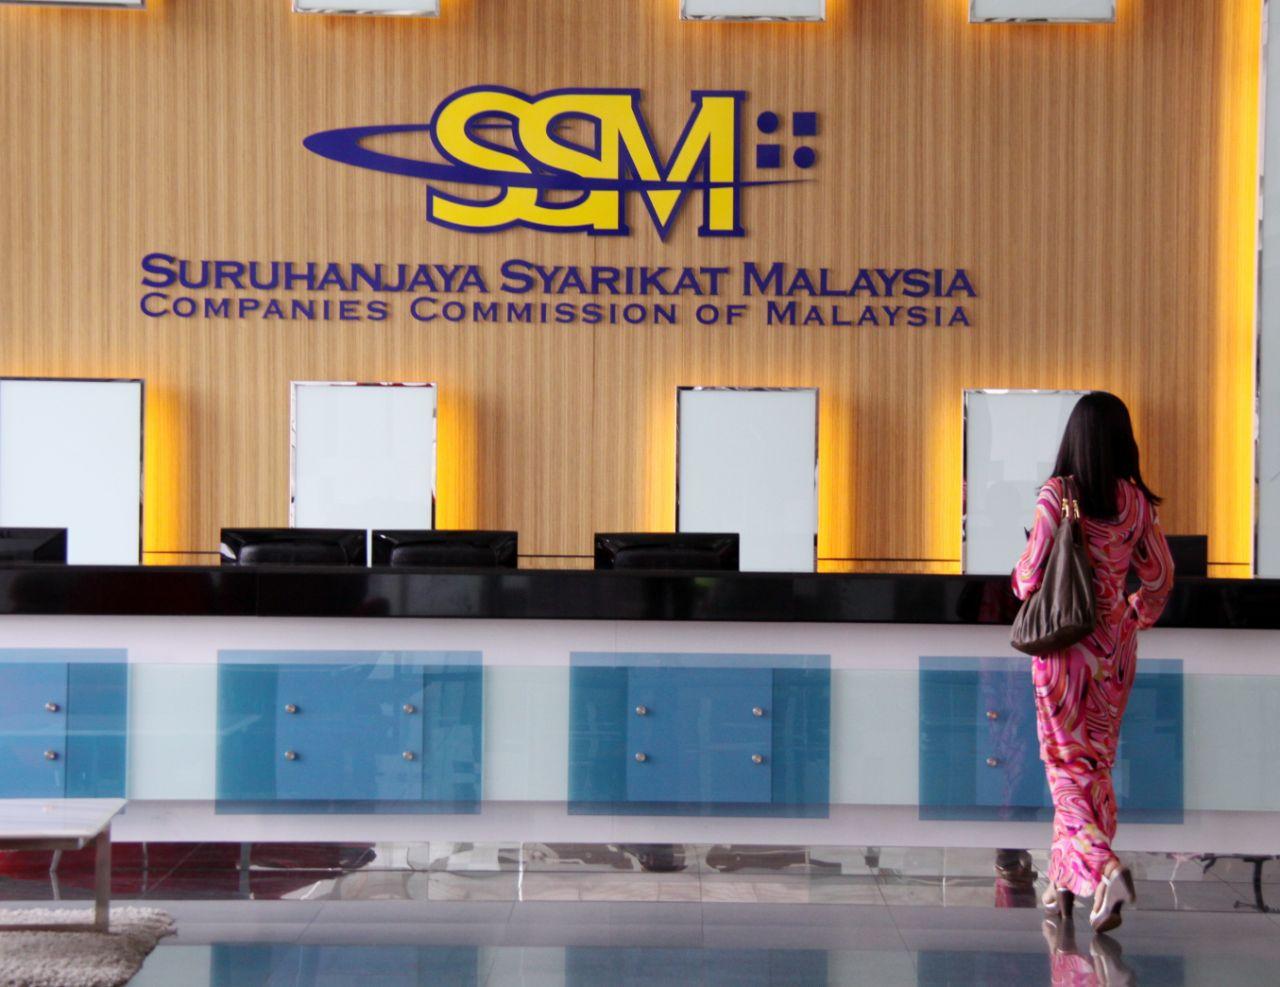 SSM Malaysia